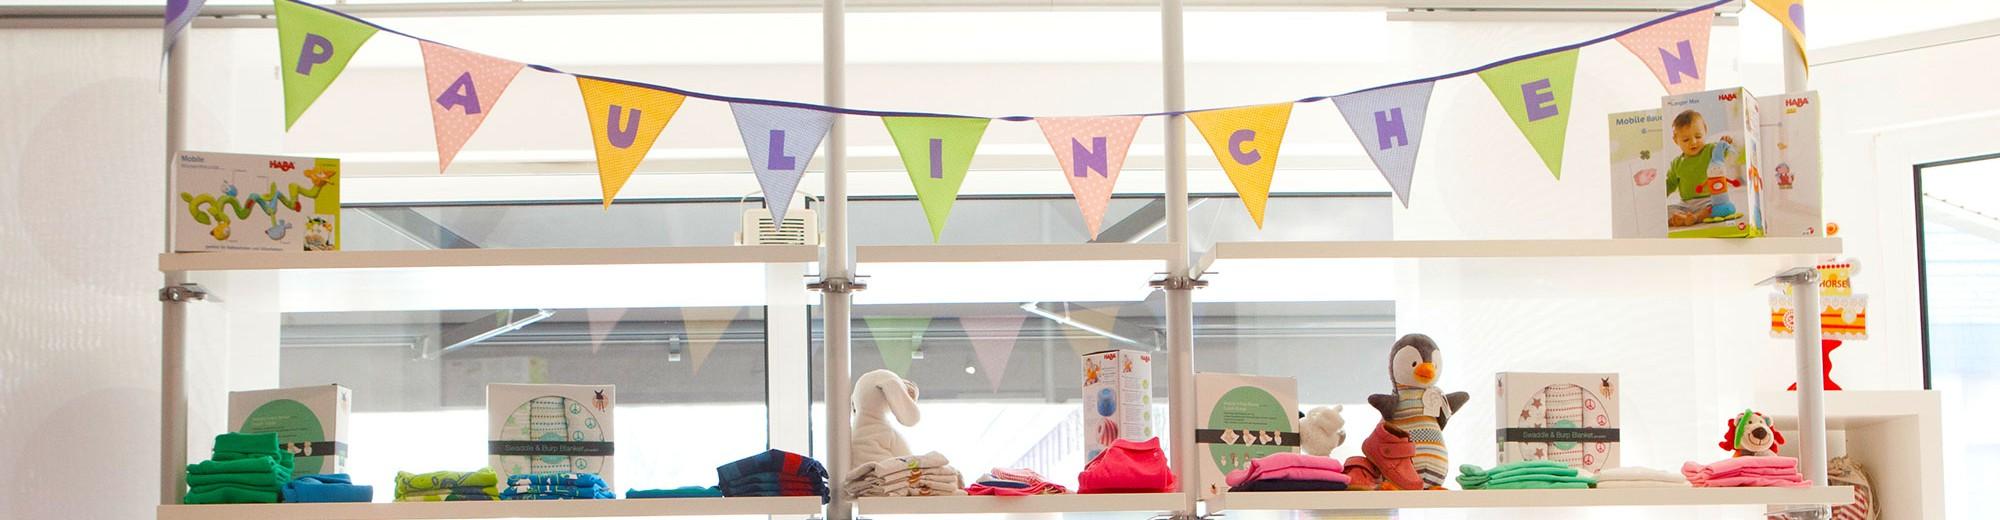 Willkommen bei Paulinchen - Kindermode Oberpleis Königswinter